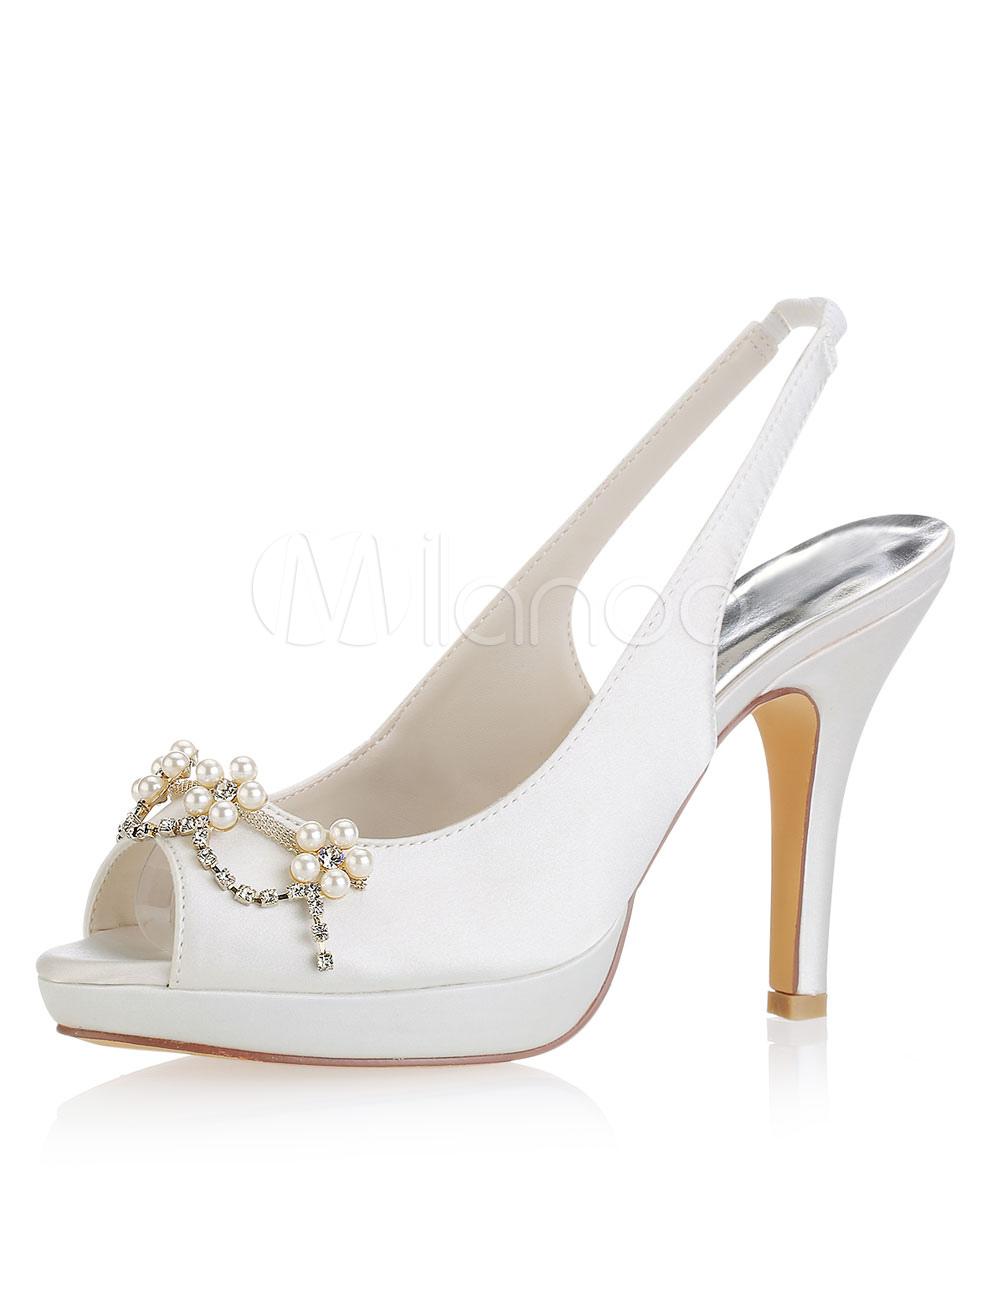 Buy Ivory Wedding Shoes Peep Toe Pearls Slingbacks Bridal Shoes Women High Heels for $57.59 in Milanoo store